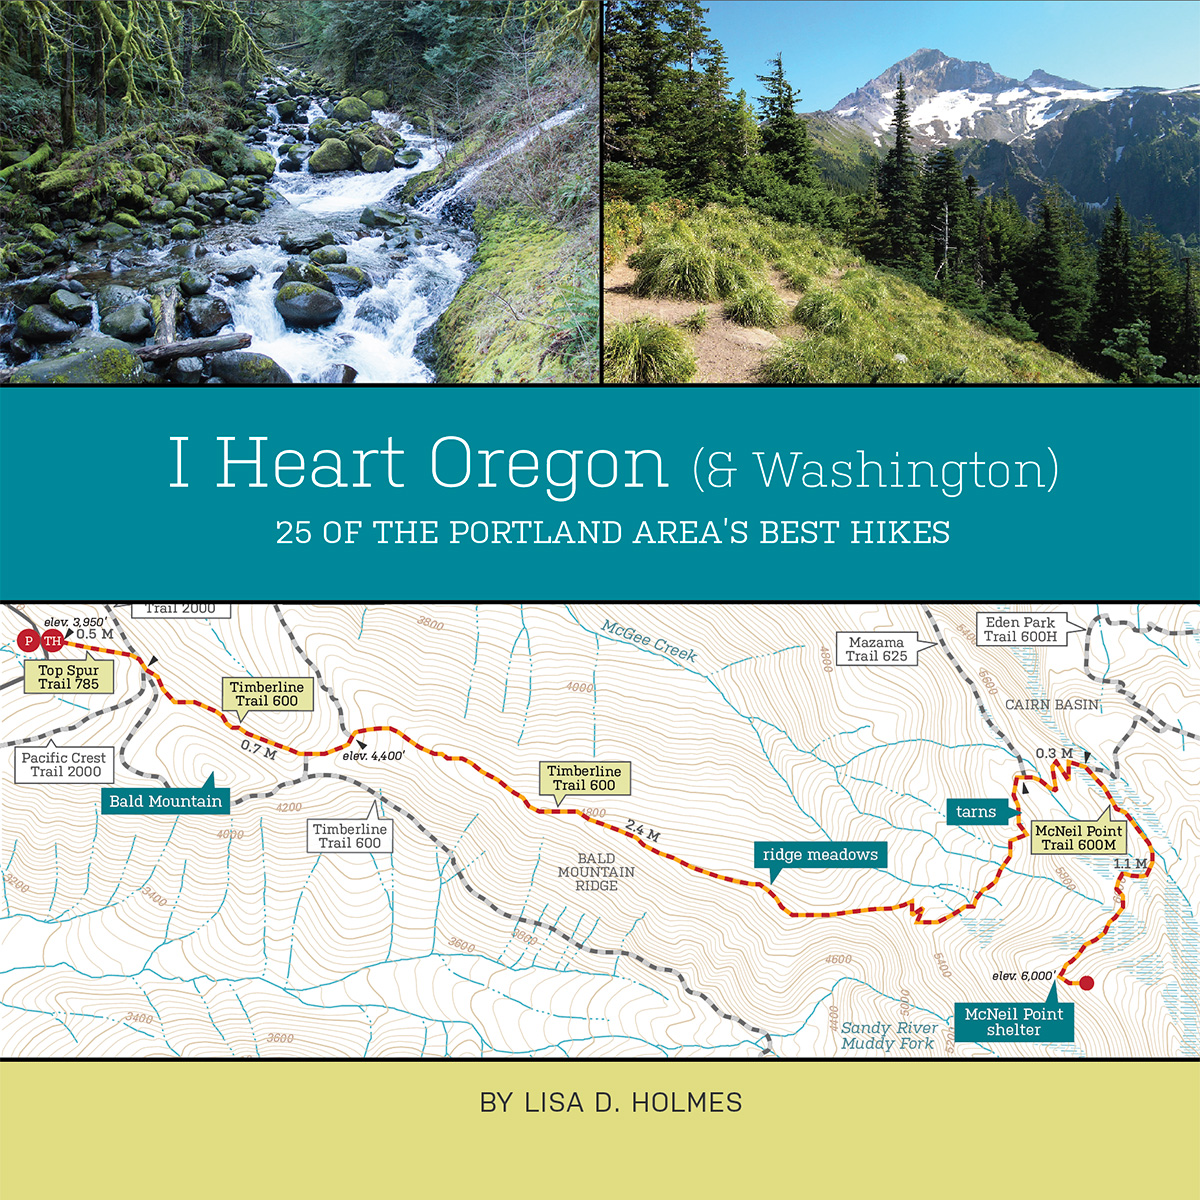 Book Design: I Heart Oregon guidebook